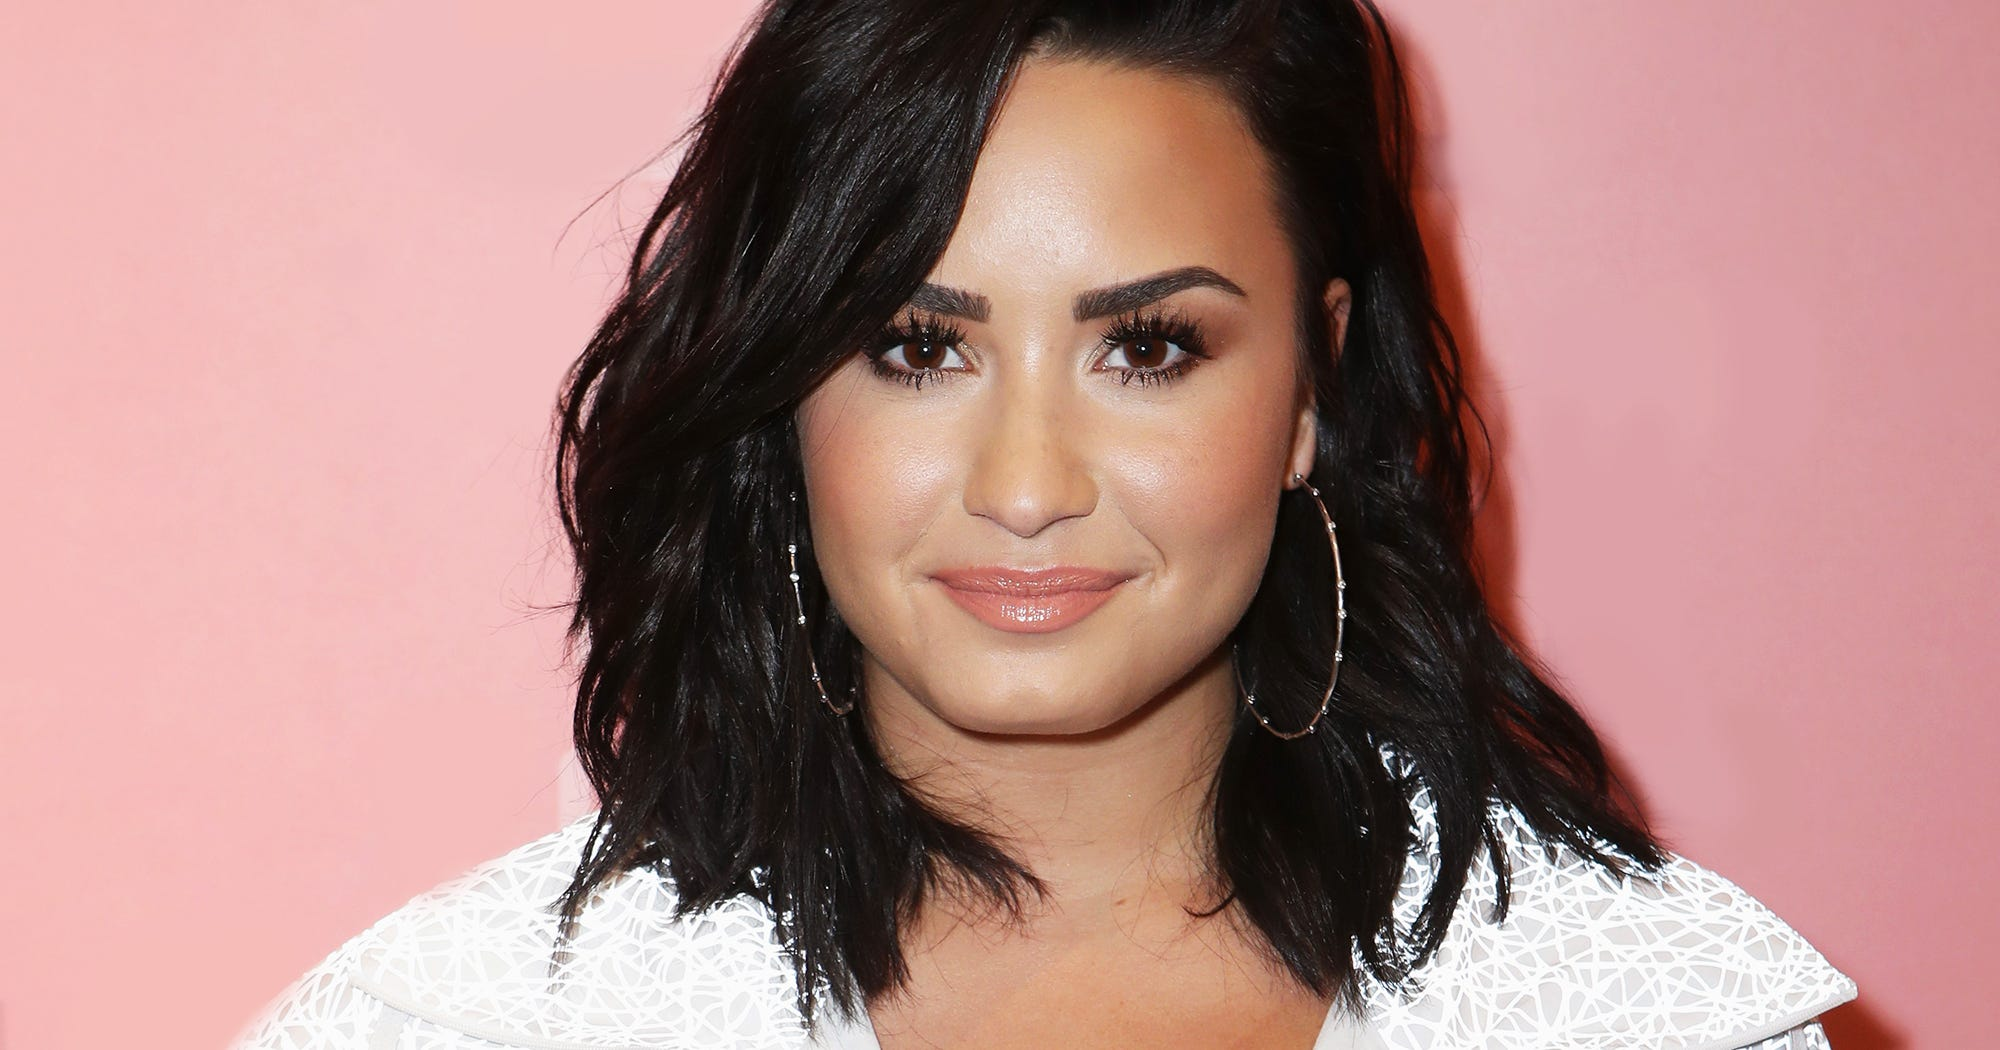 Demi Lovato Reveals Tiny Finger Tattoo About Self-Love